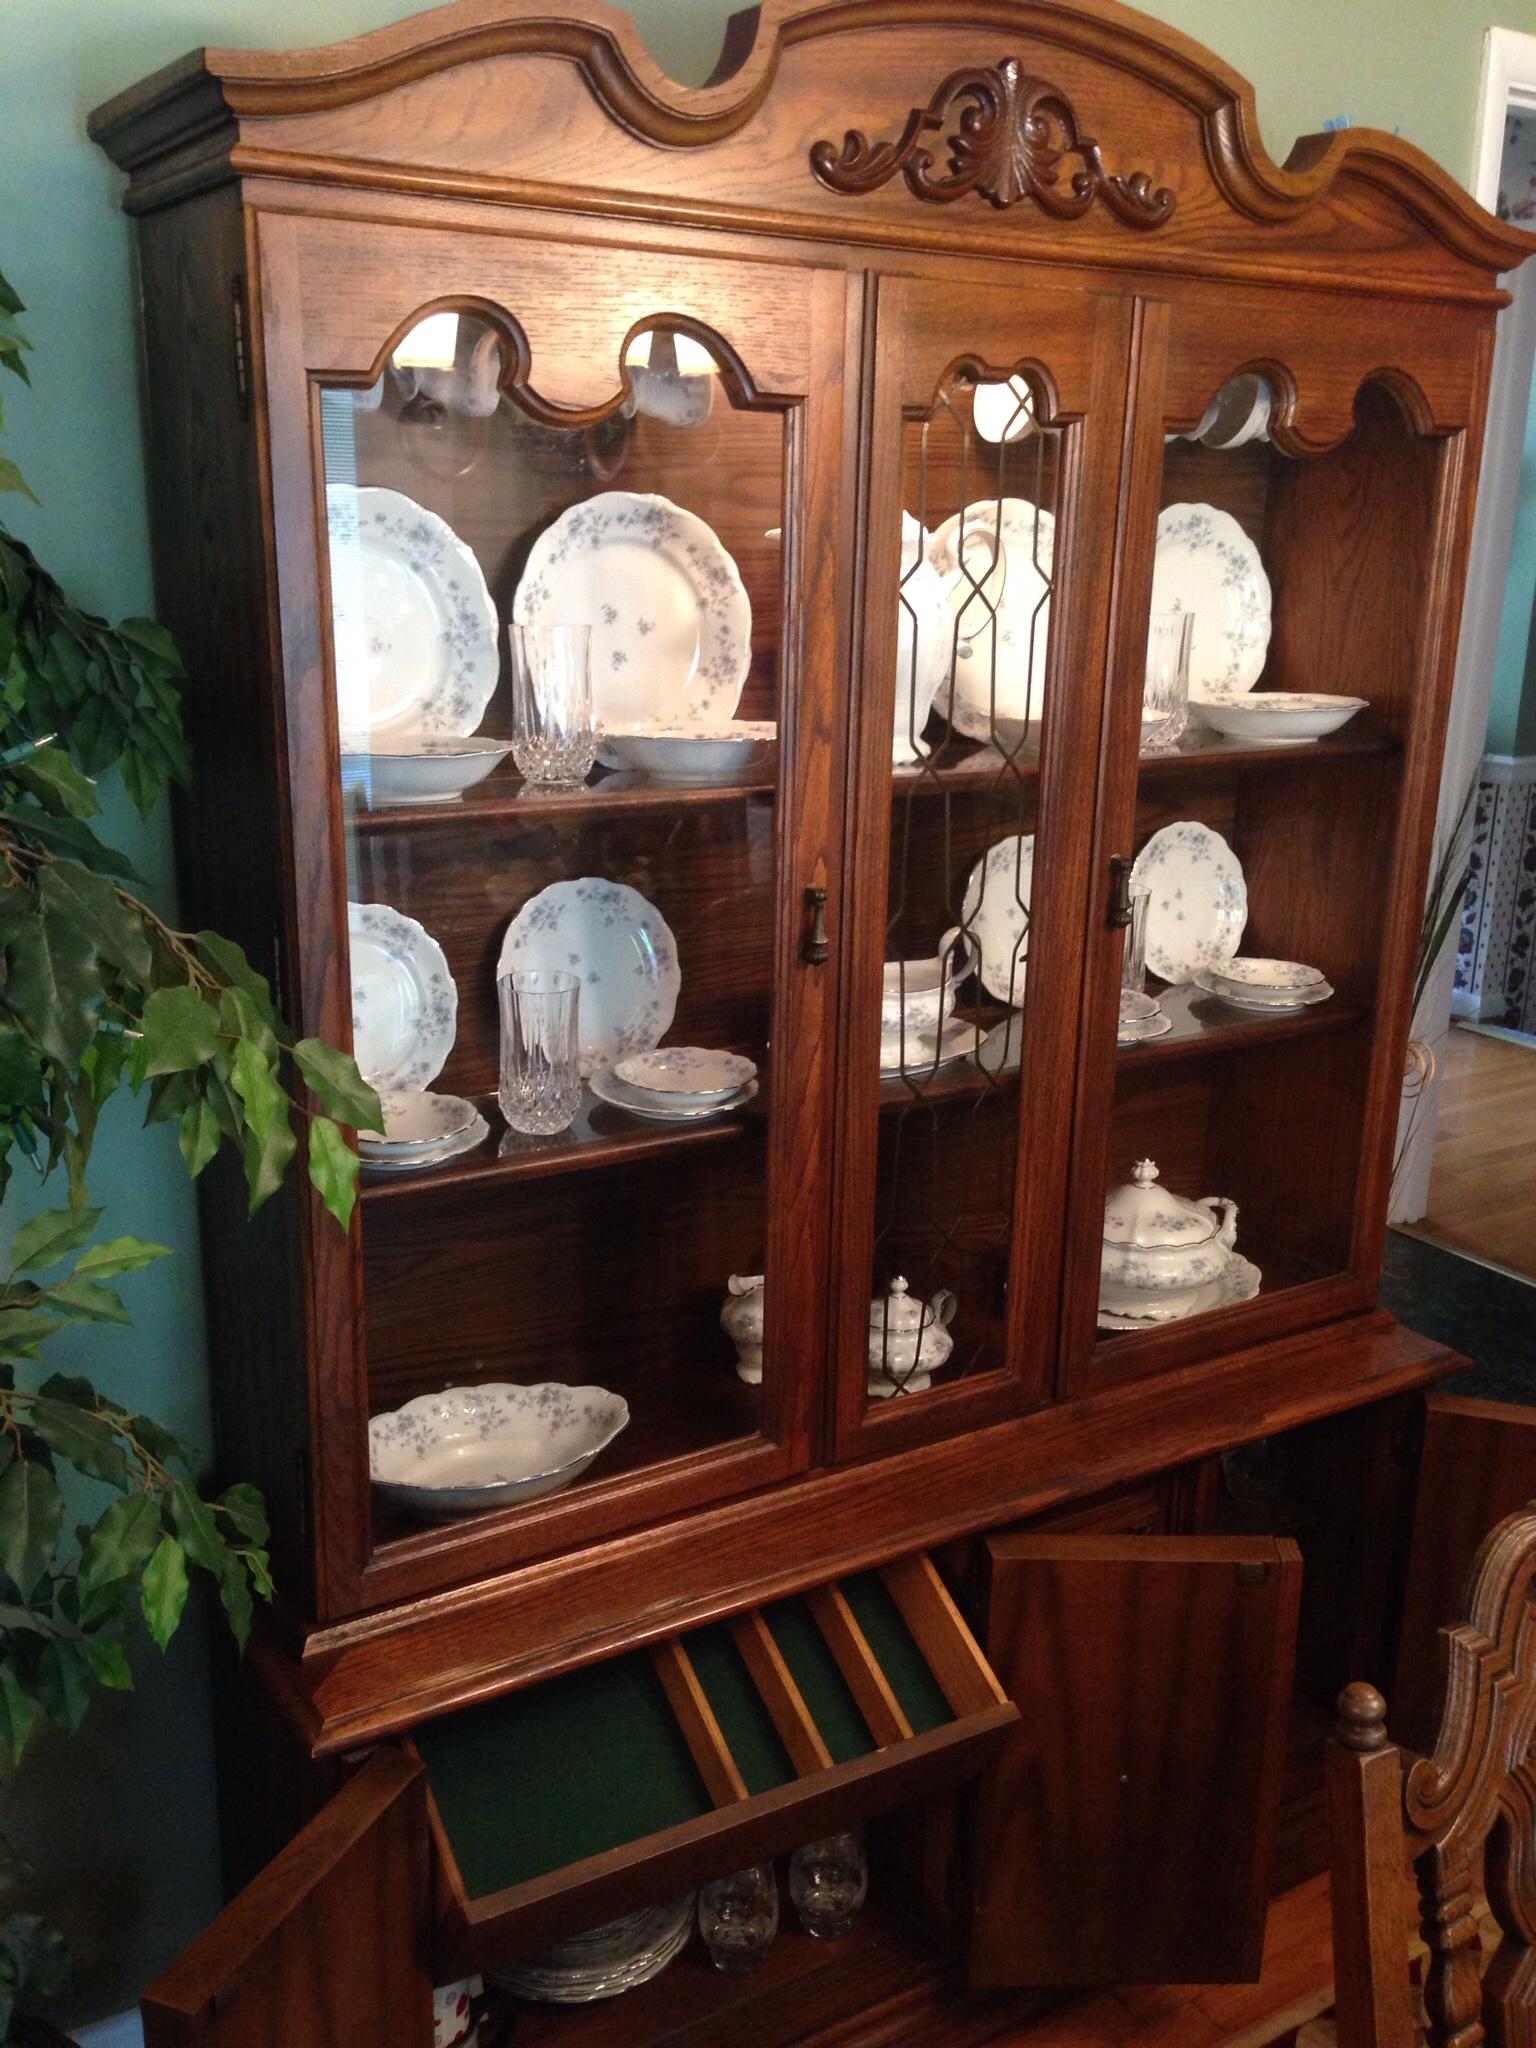 Garrison Furniture Company Antique Appraisal Instappraisal